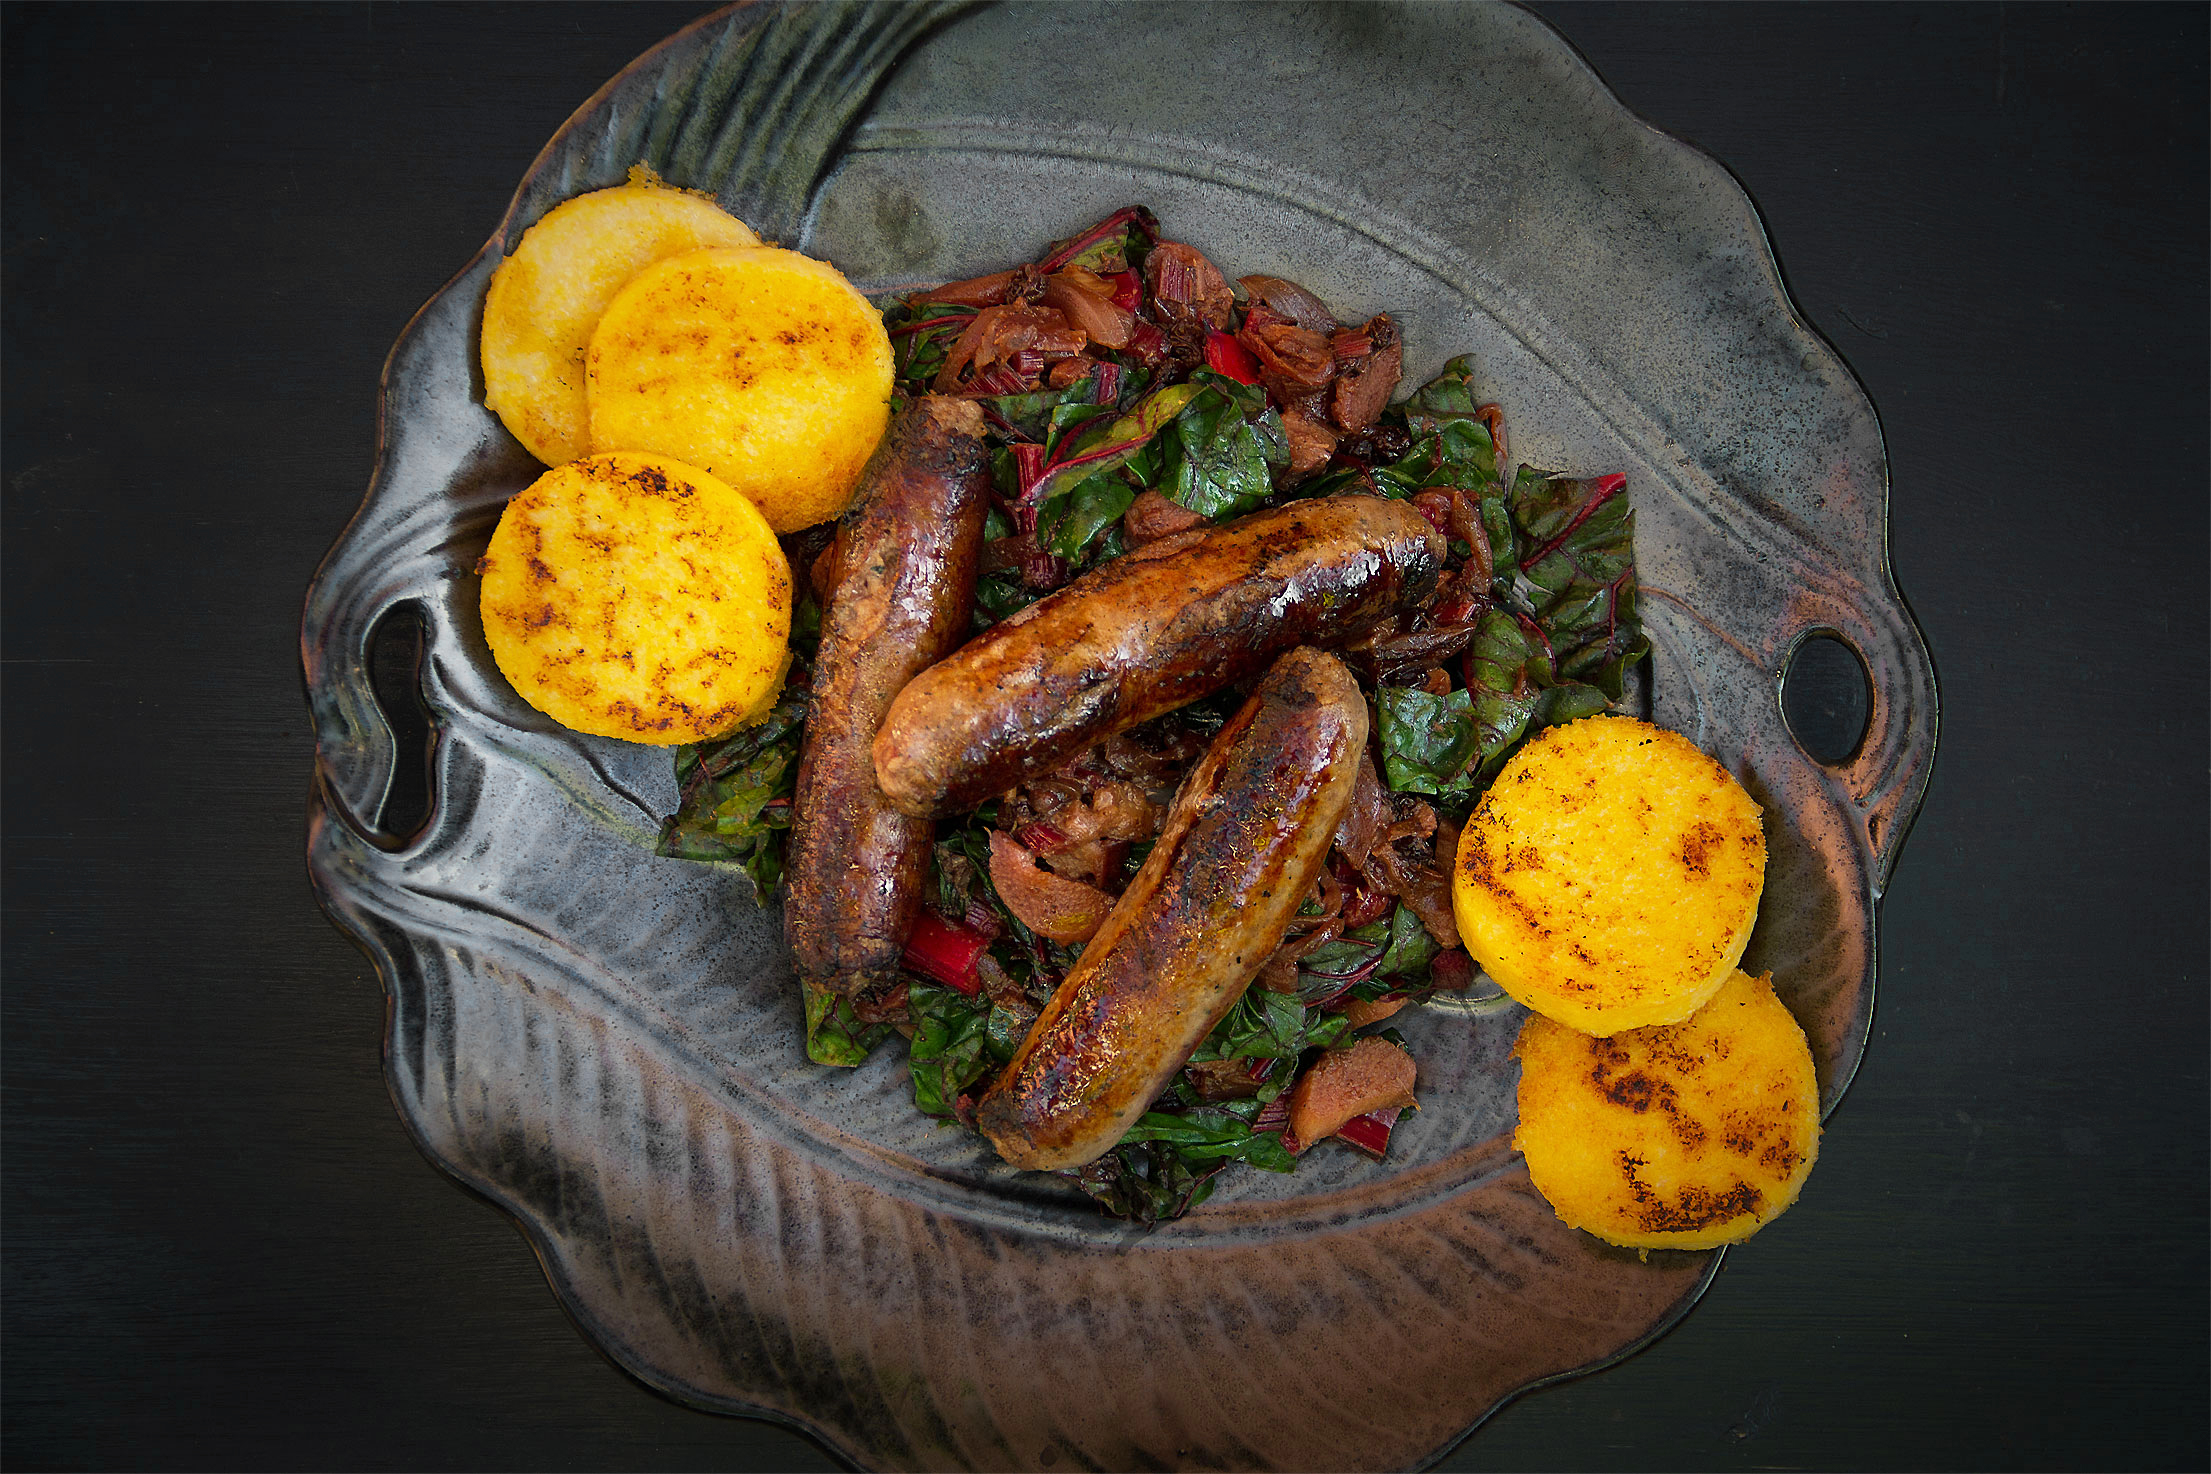 Savory Rhubarb with Sweet Sausage